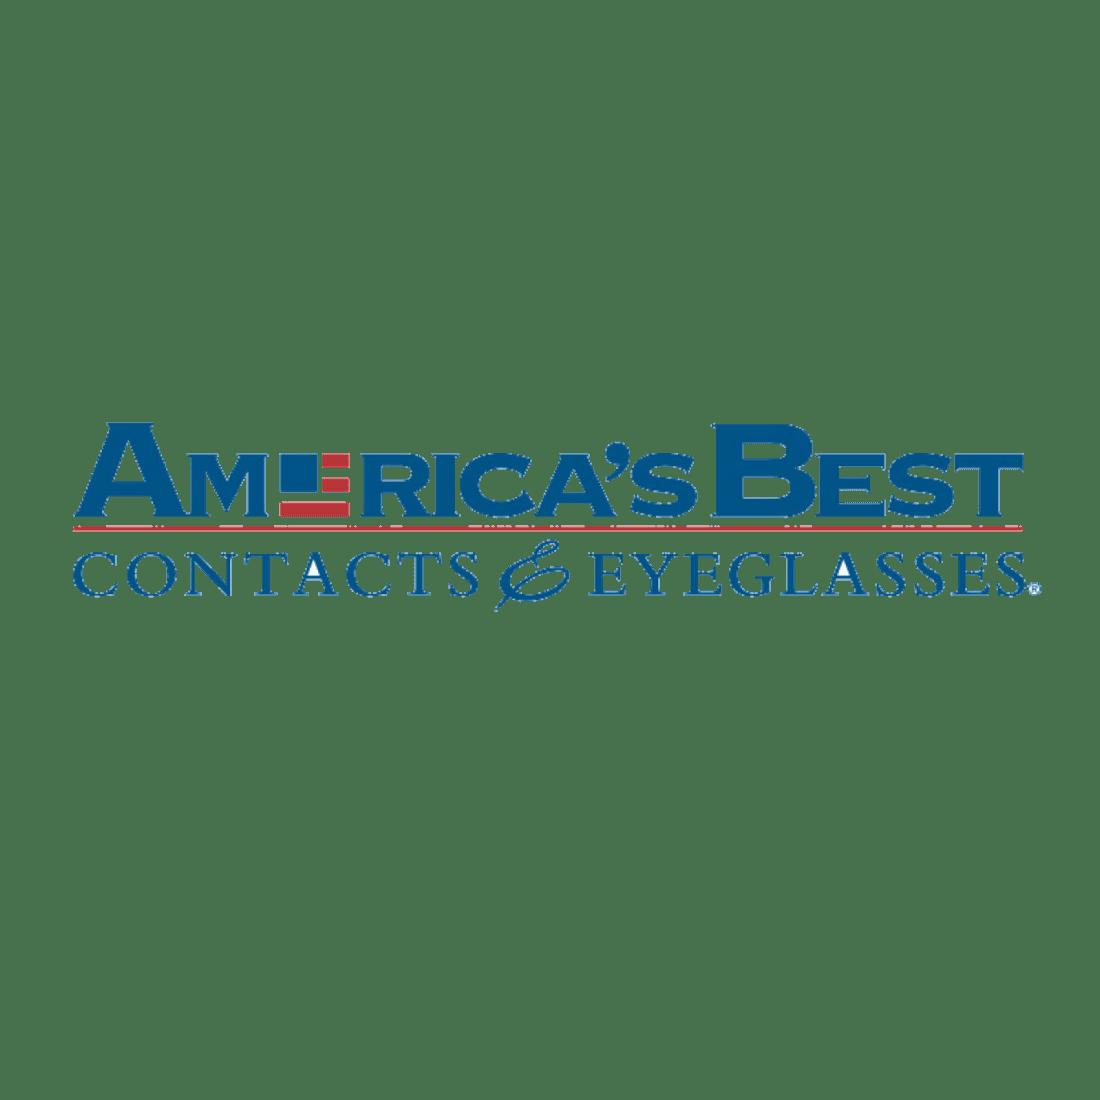 ContactsAmerica has new ACUVUE Rebates